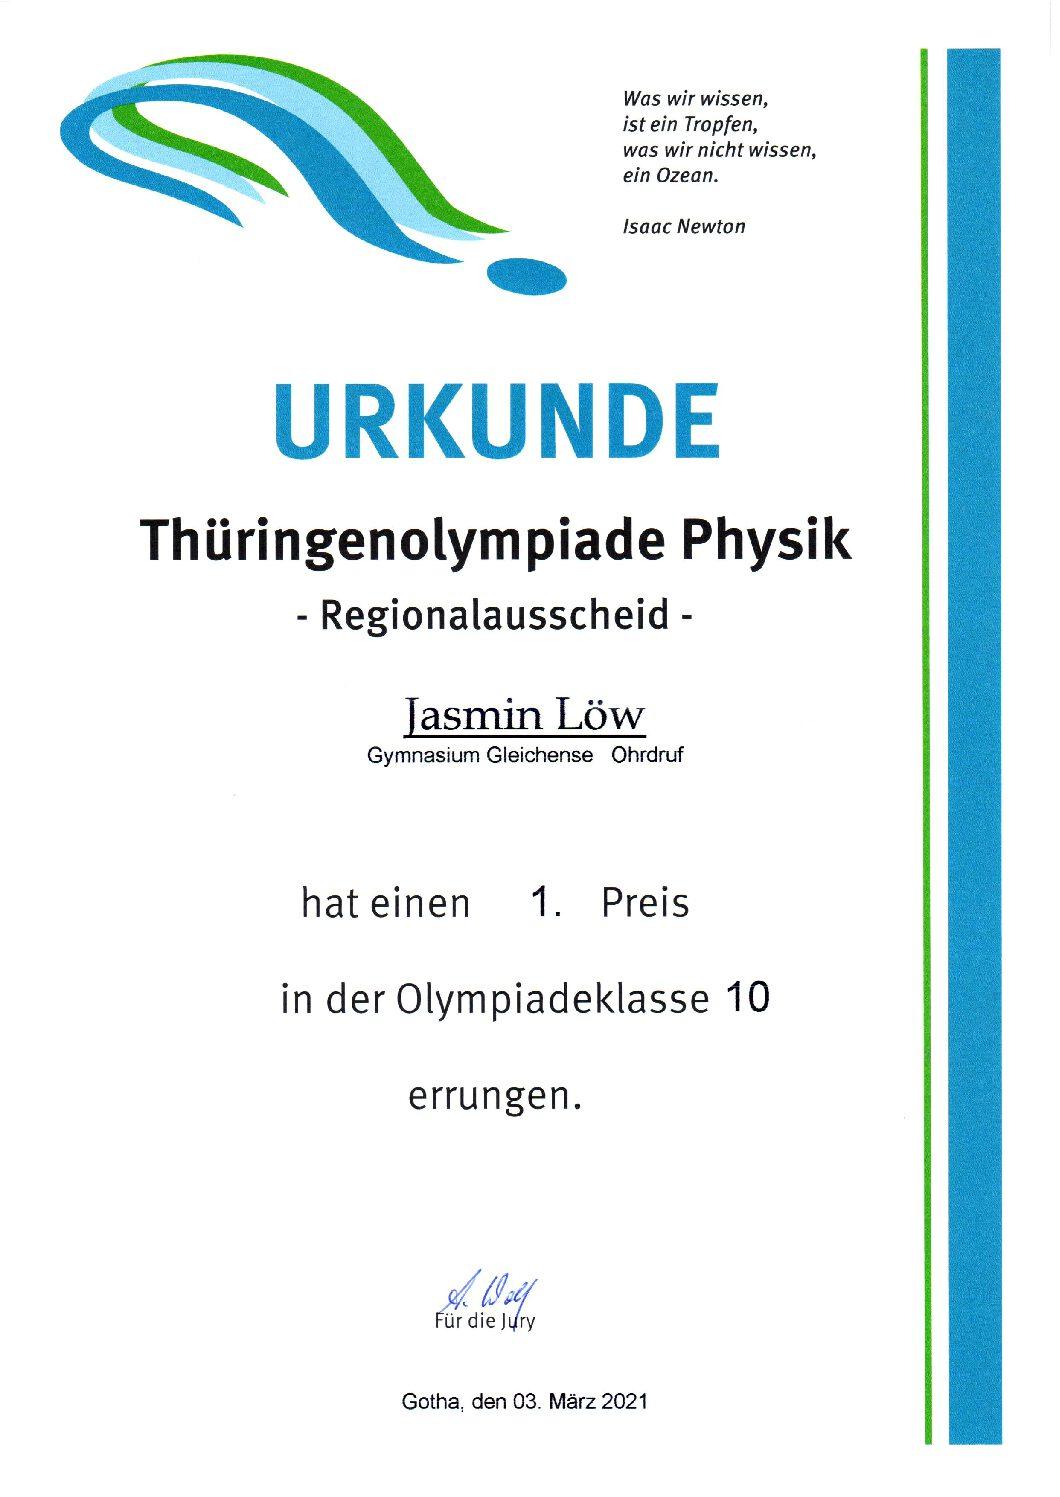 Spitzenergebnis bei Physikolympiade